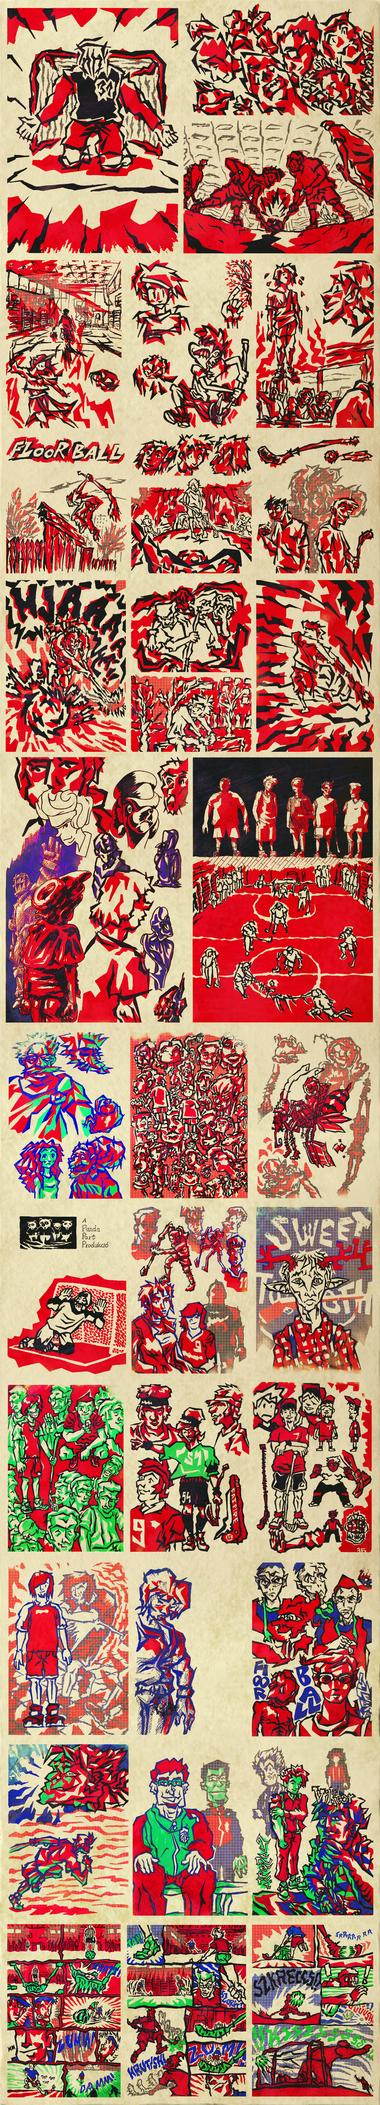 sketch-collection-3 by GaraboncziA